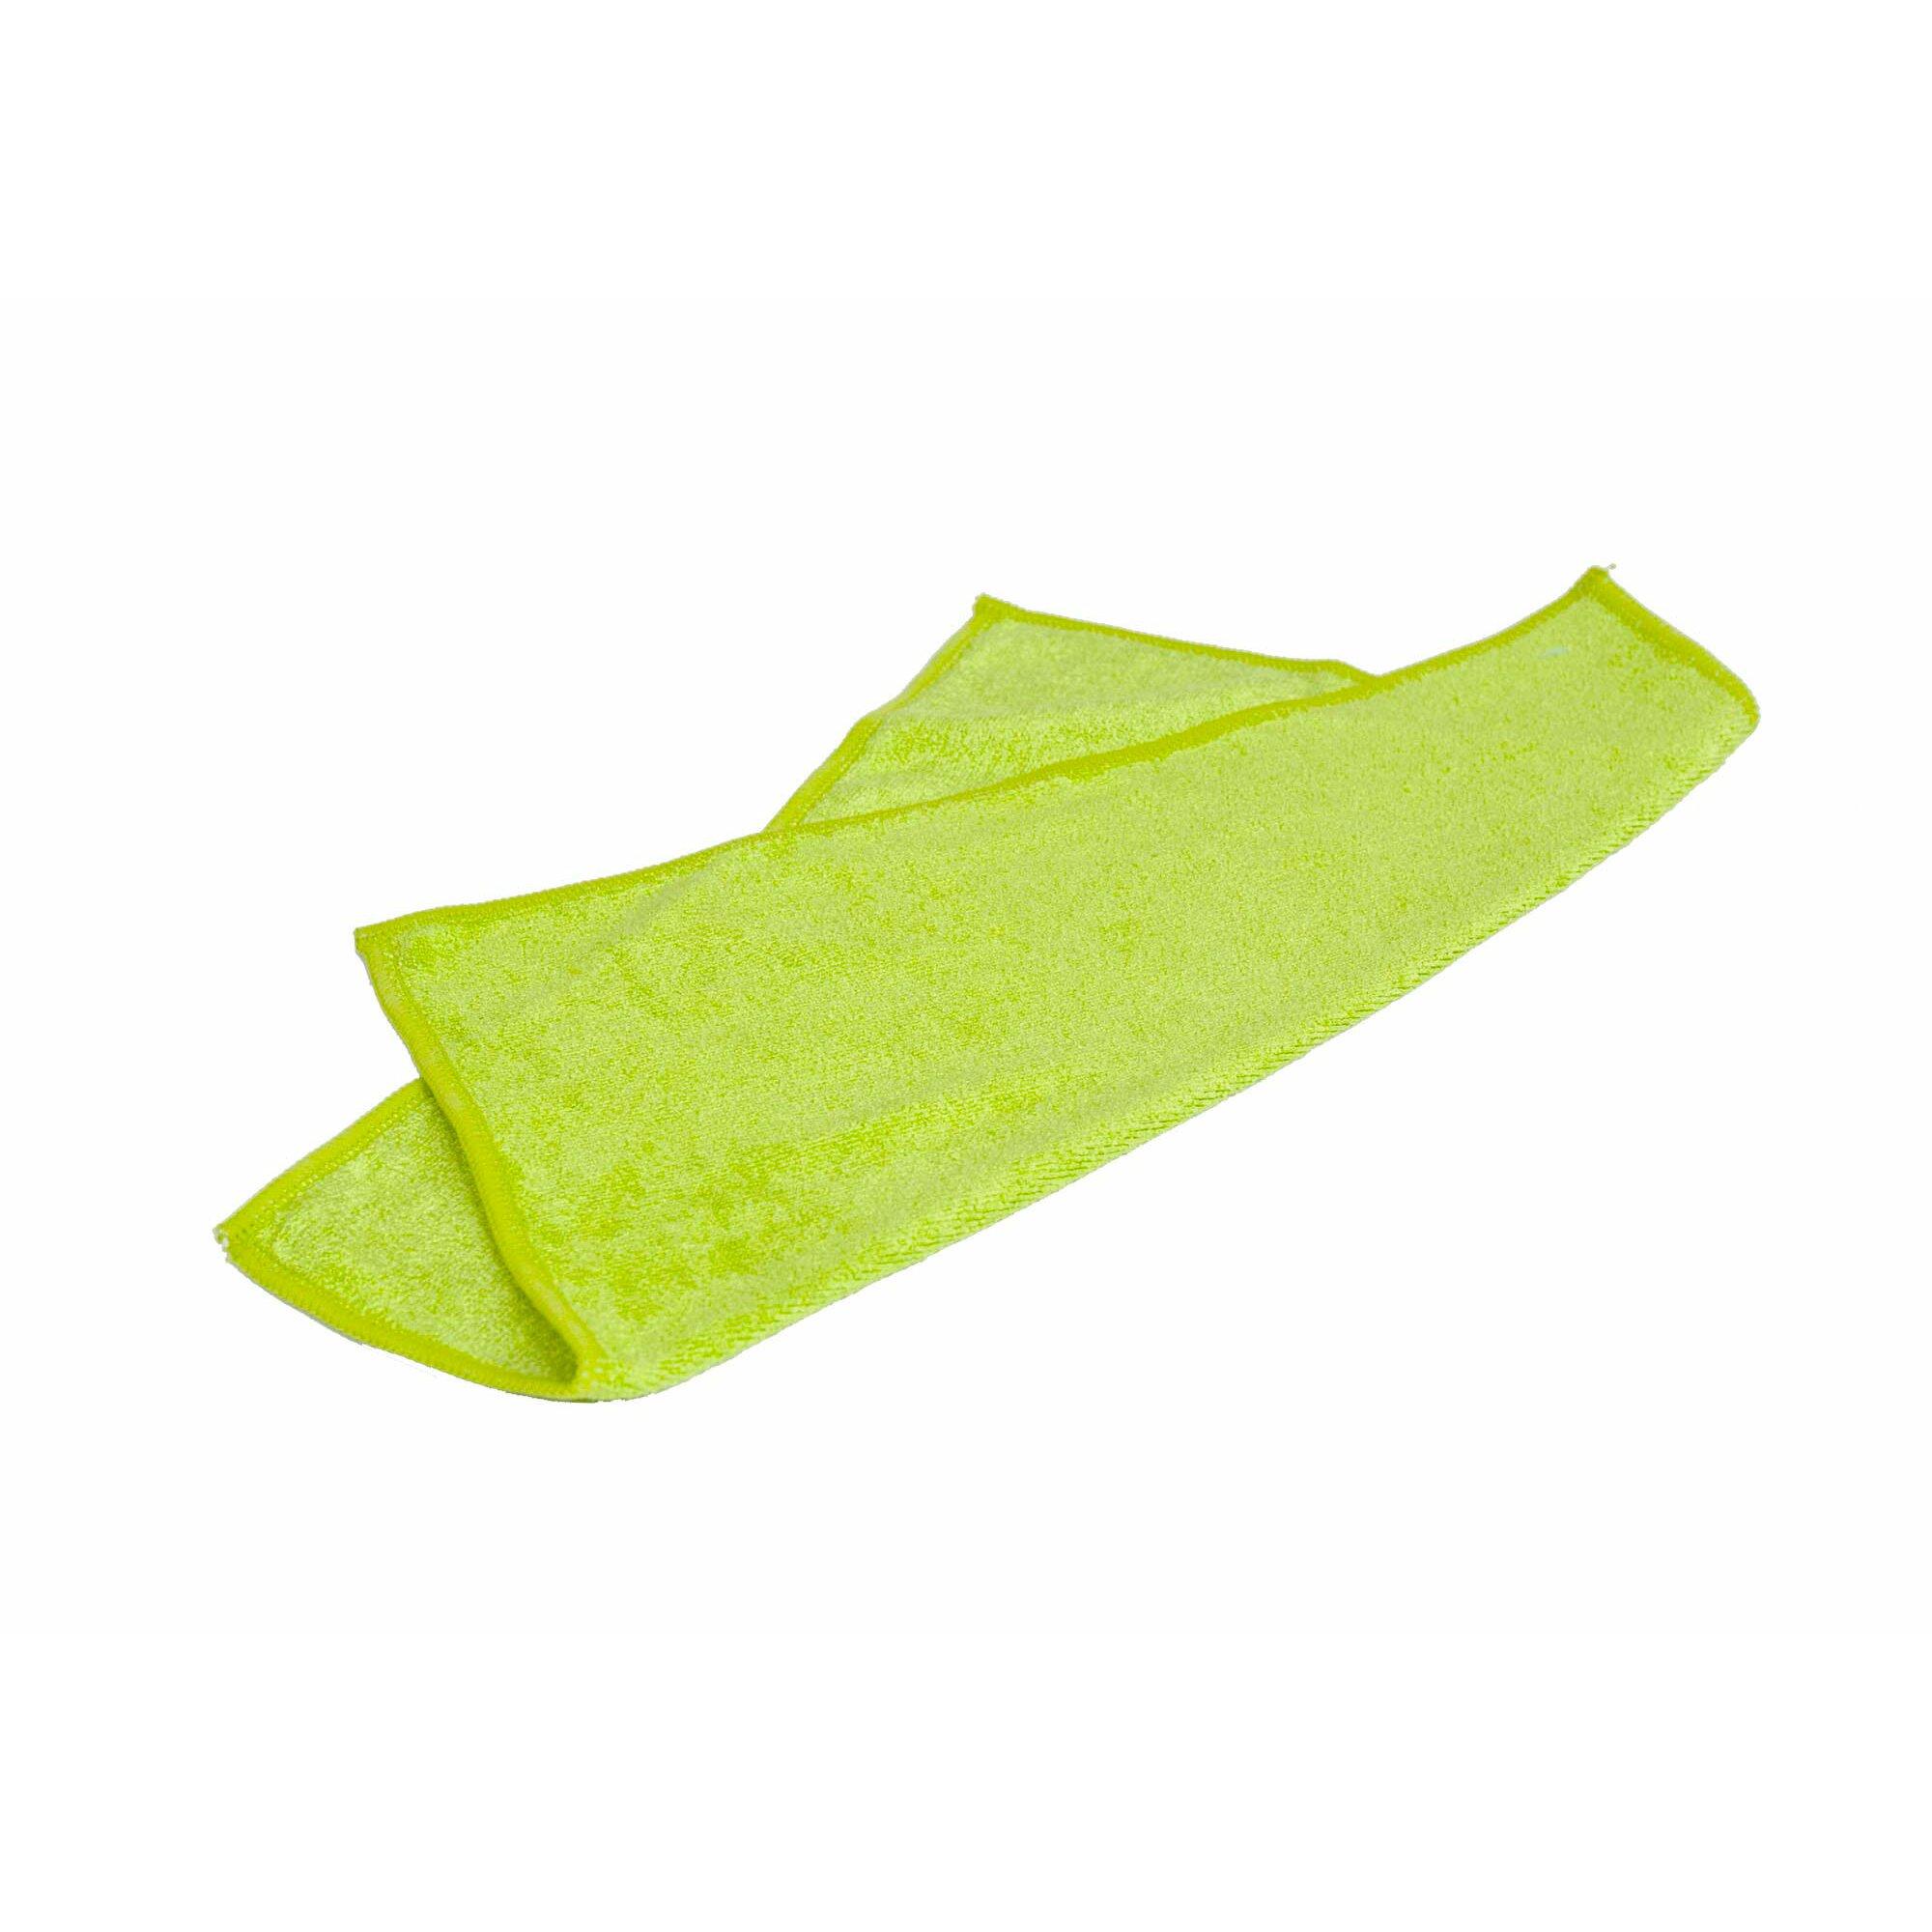 Microfiber Cloth Bundle: Casabella Microfiber Cleaning Bundle